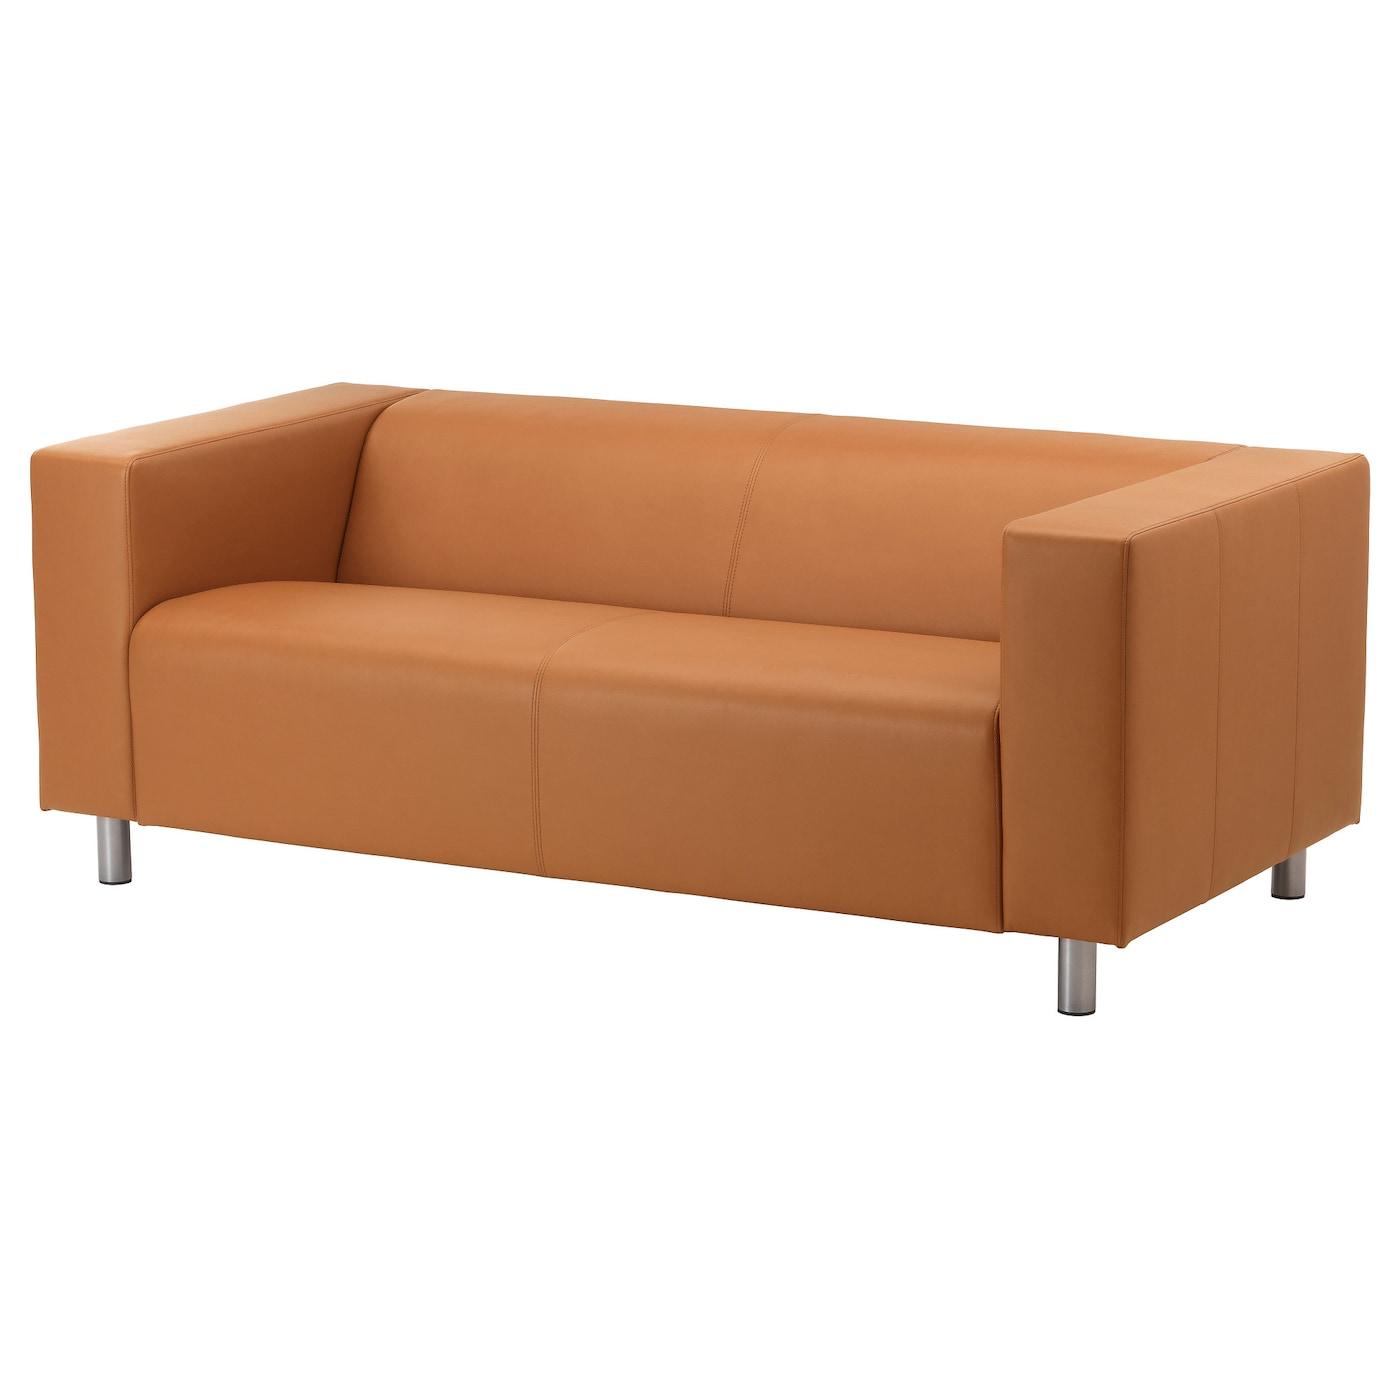 KLIPPAN Two seat sofa Kimstad light brown IKEA